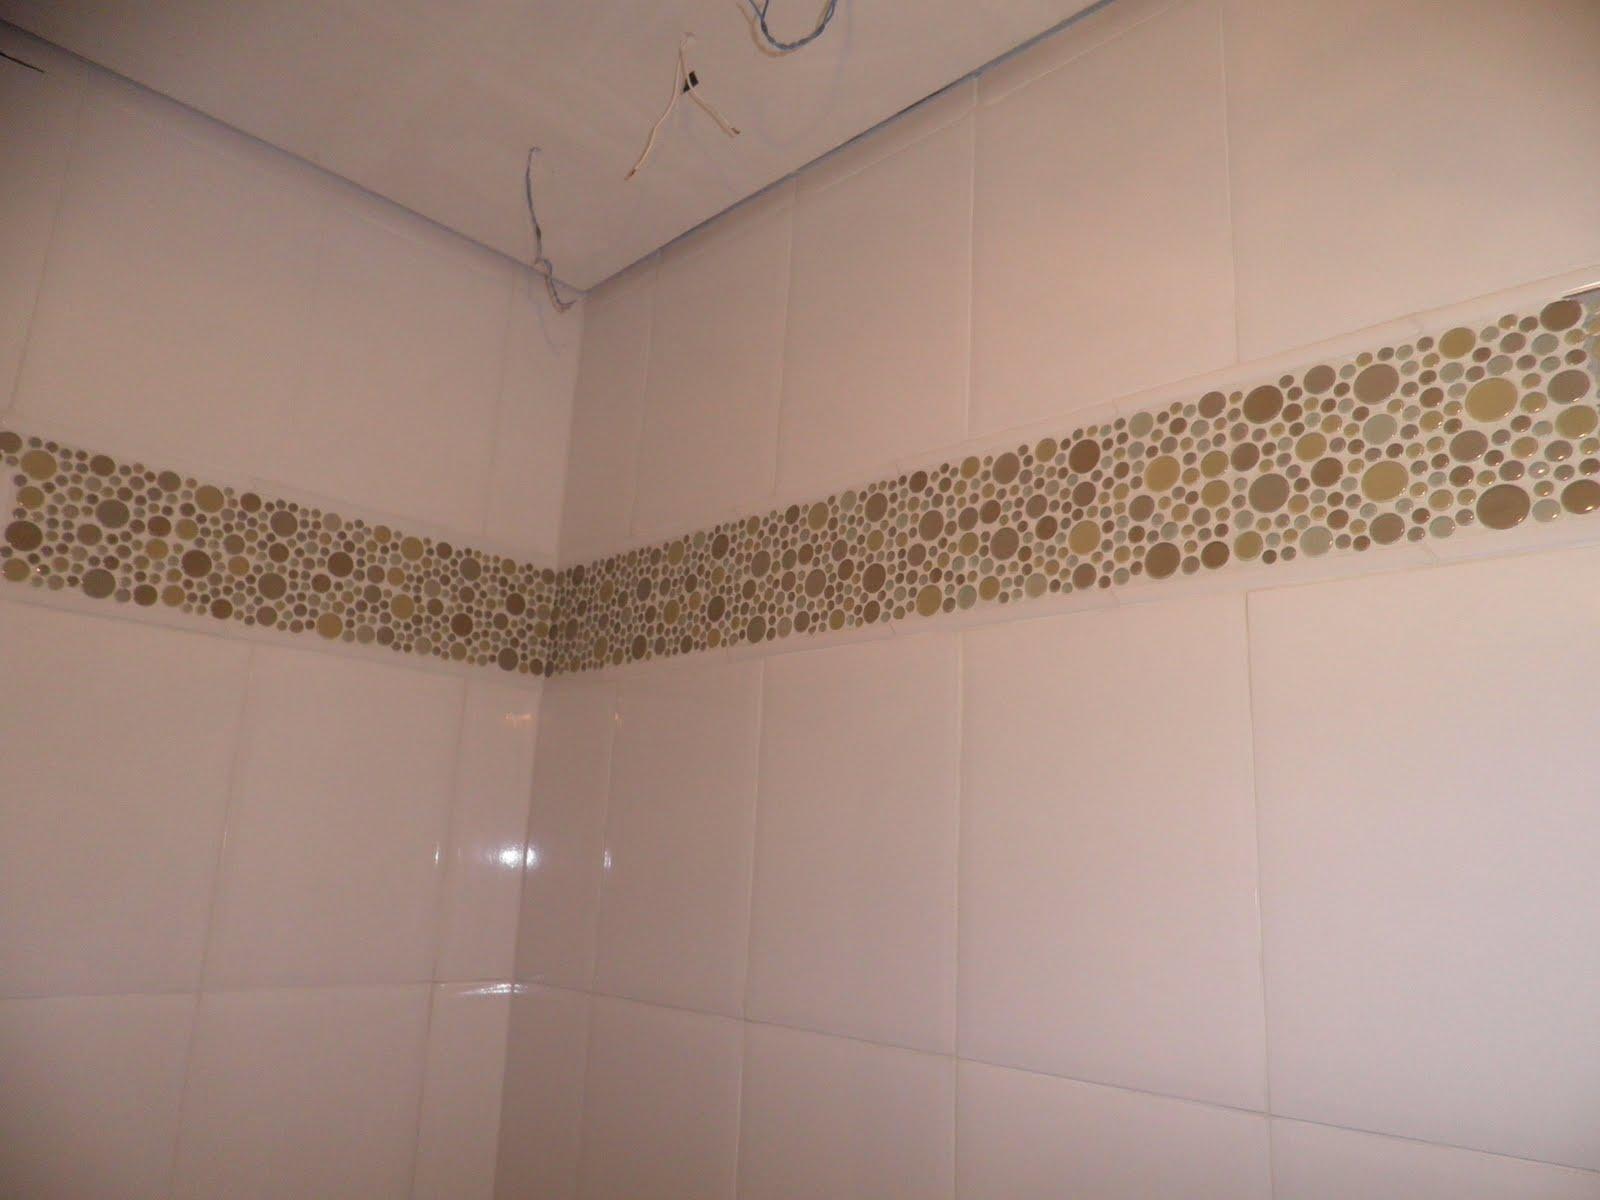 REFORMANDO A DISTANCIA: Bancada do Banheiro Linda!!! #664C3A 1600 1200